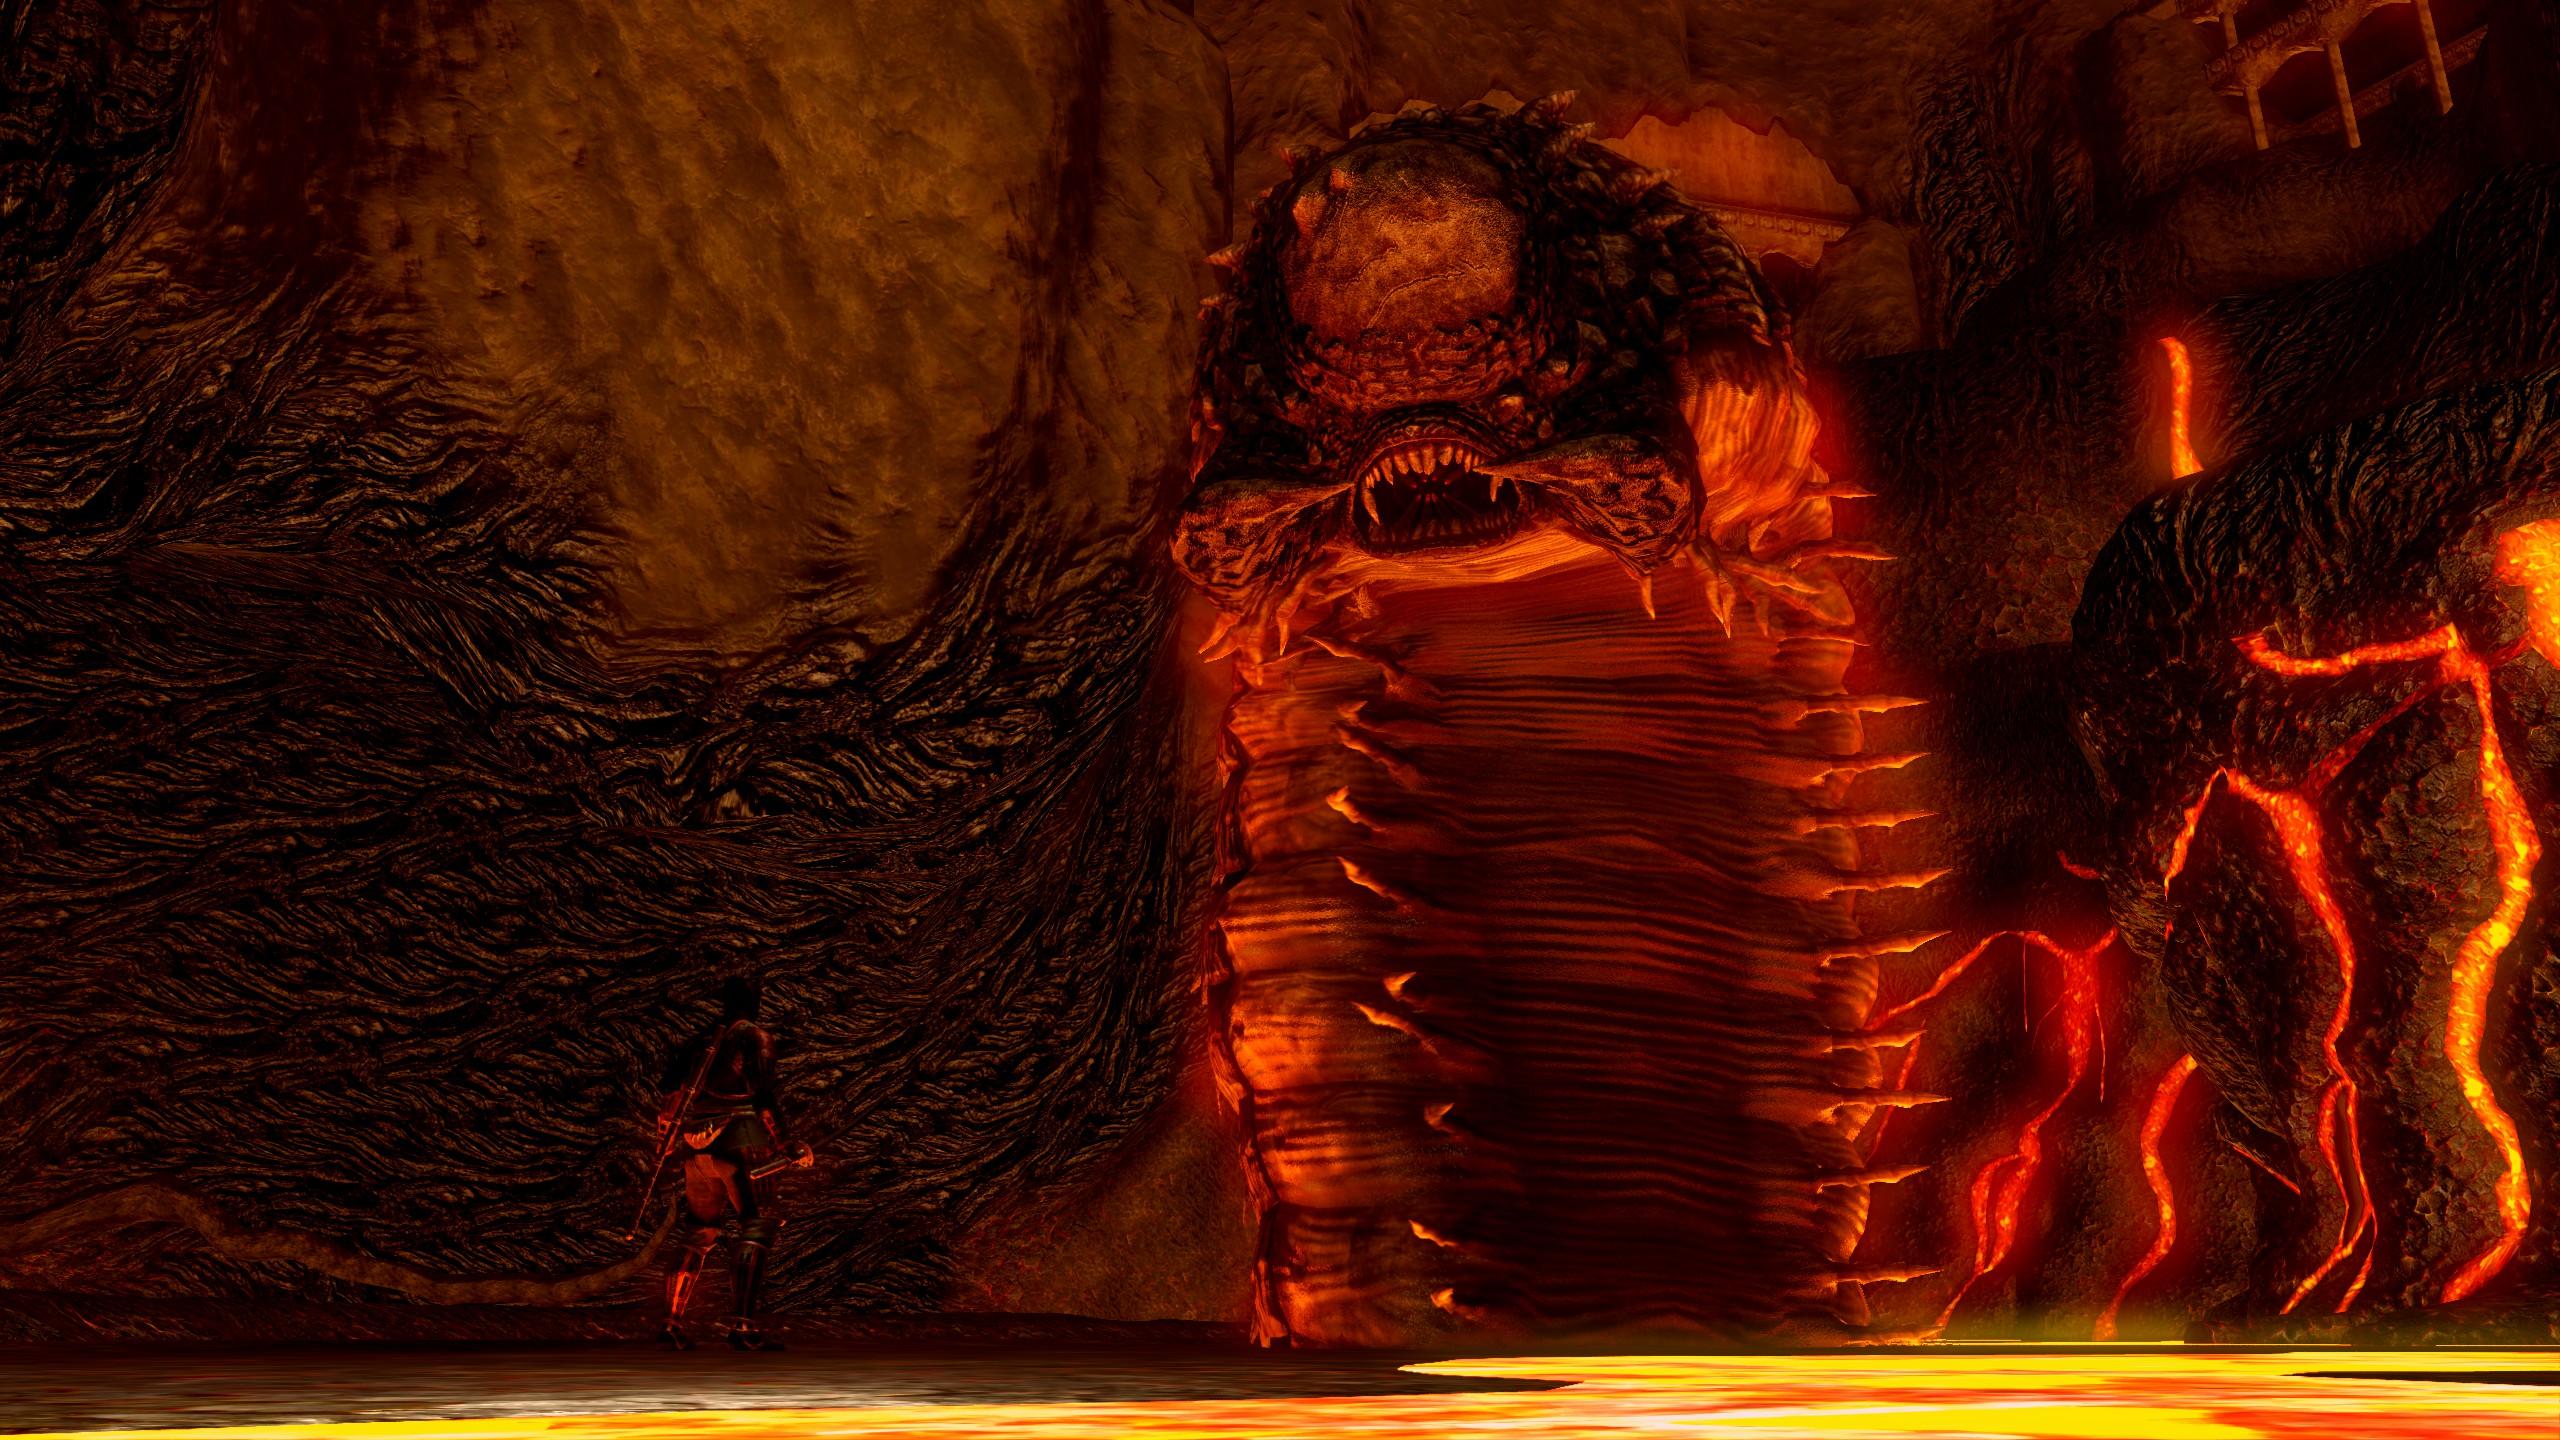 Impressive fan-made Dark Souls sequel will release a month before Elden Ring